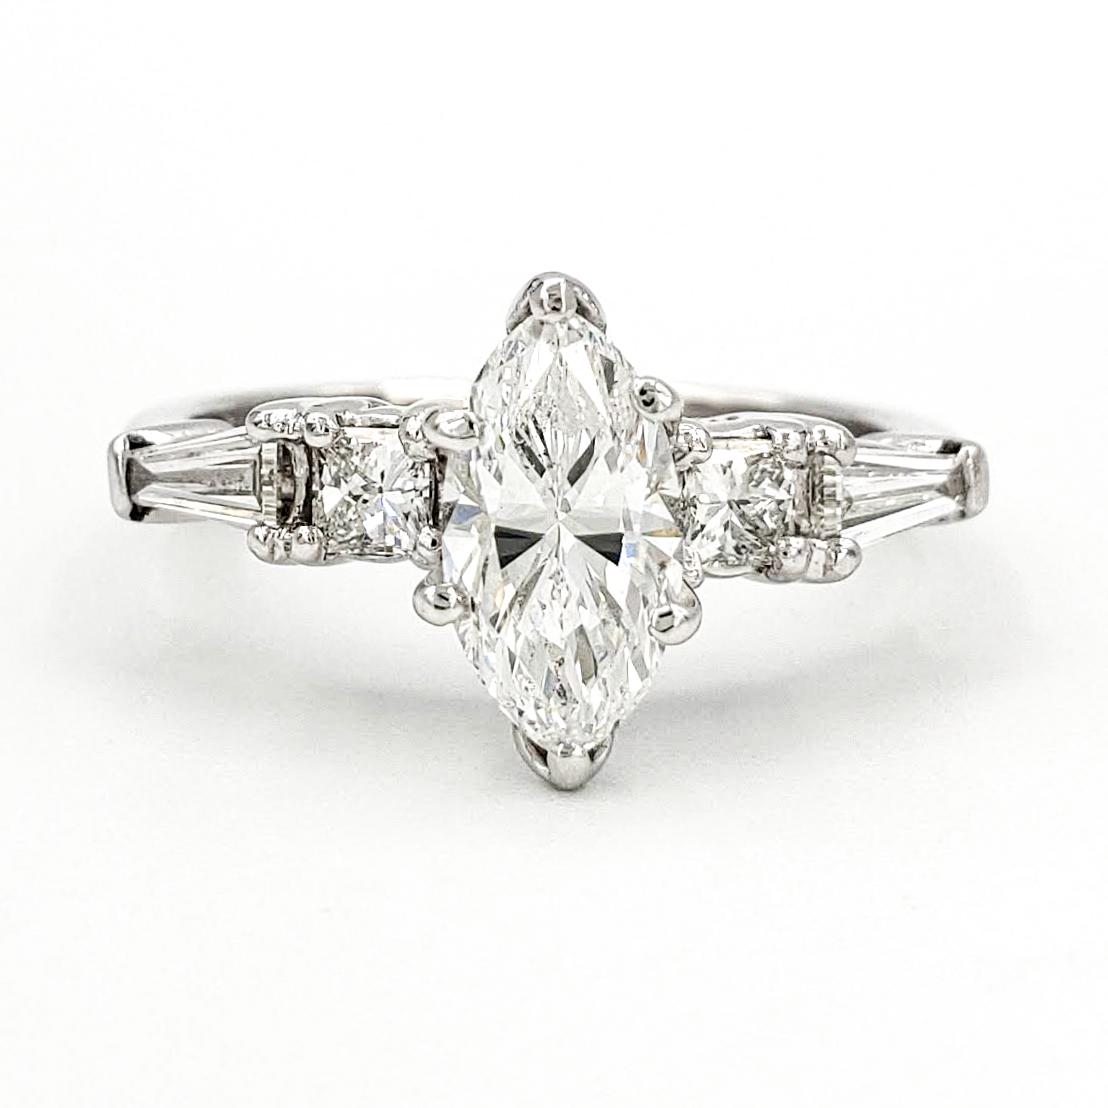 estate-platinum-engagement-ring-with-1-03-carat-marquise-cut-diamond-gia-d-si1